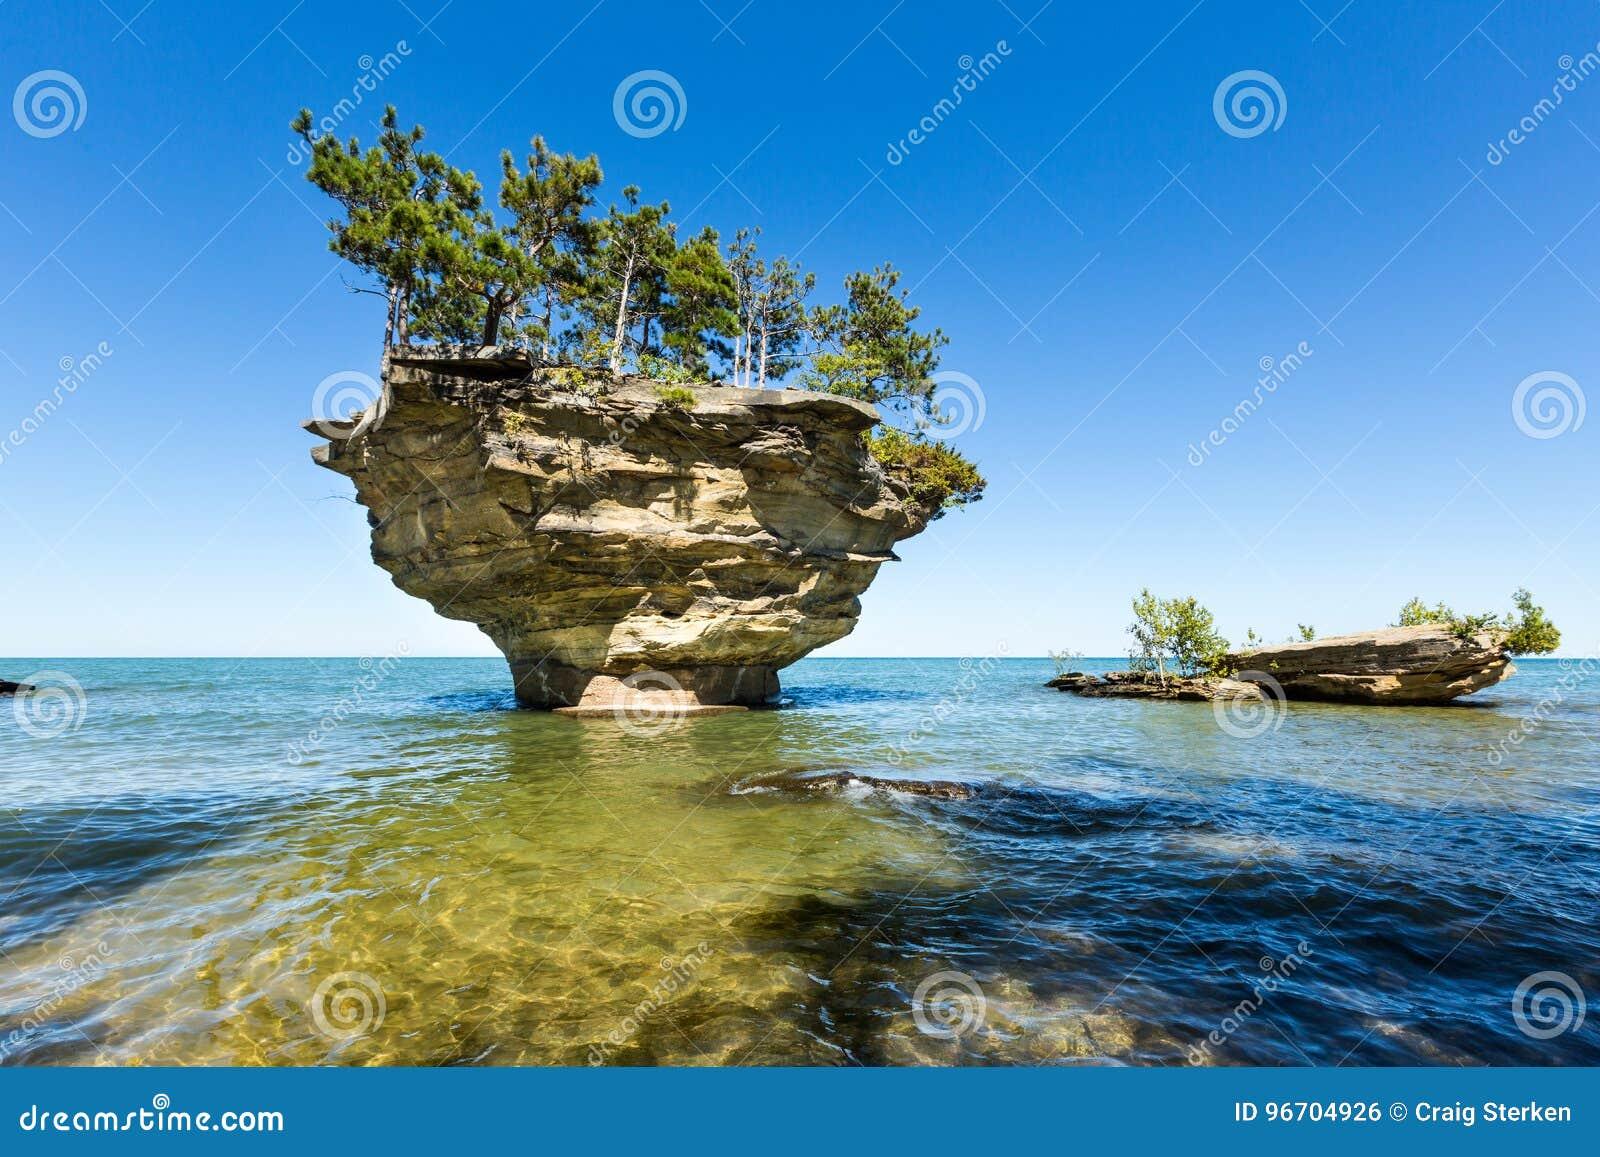 Lake Huron`s Turnip Rock, near Port Austin Michigan